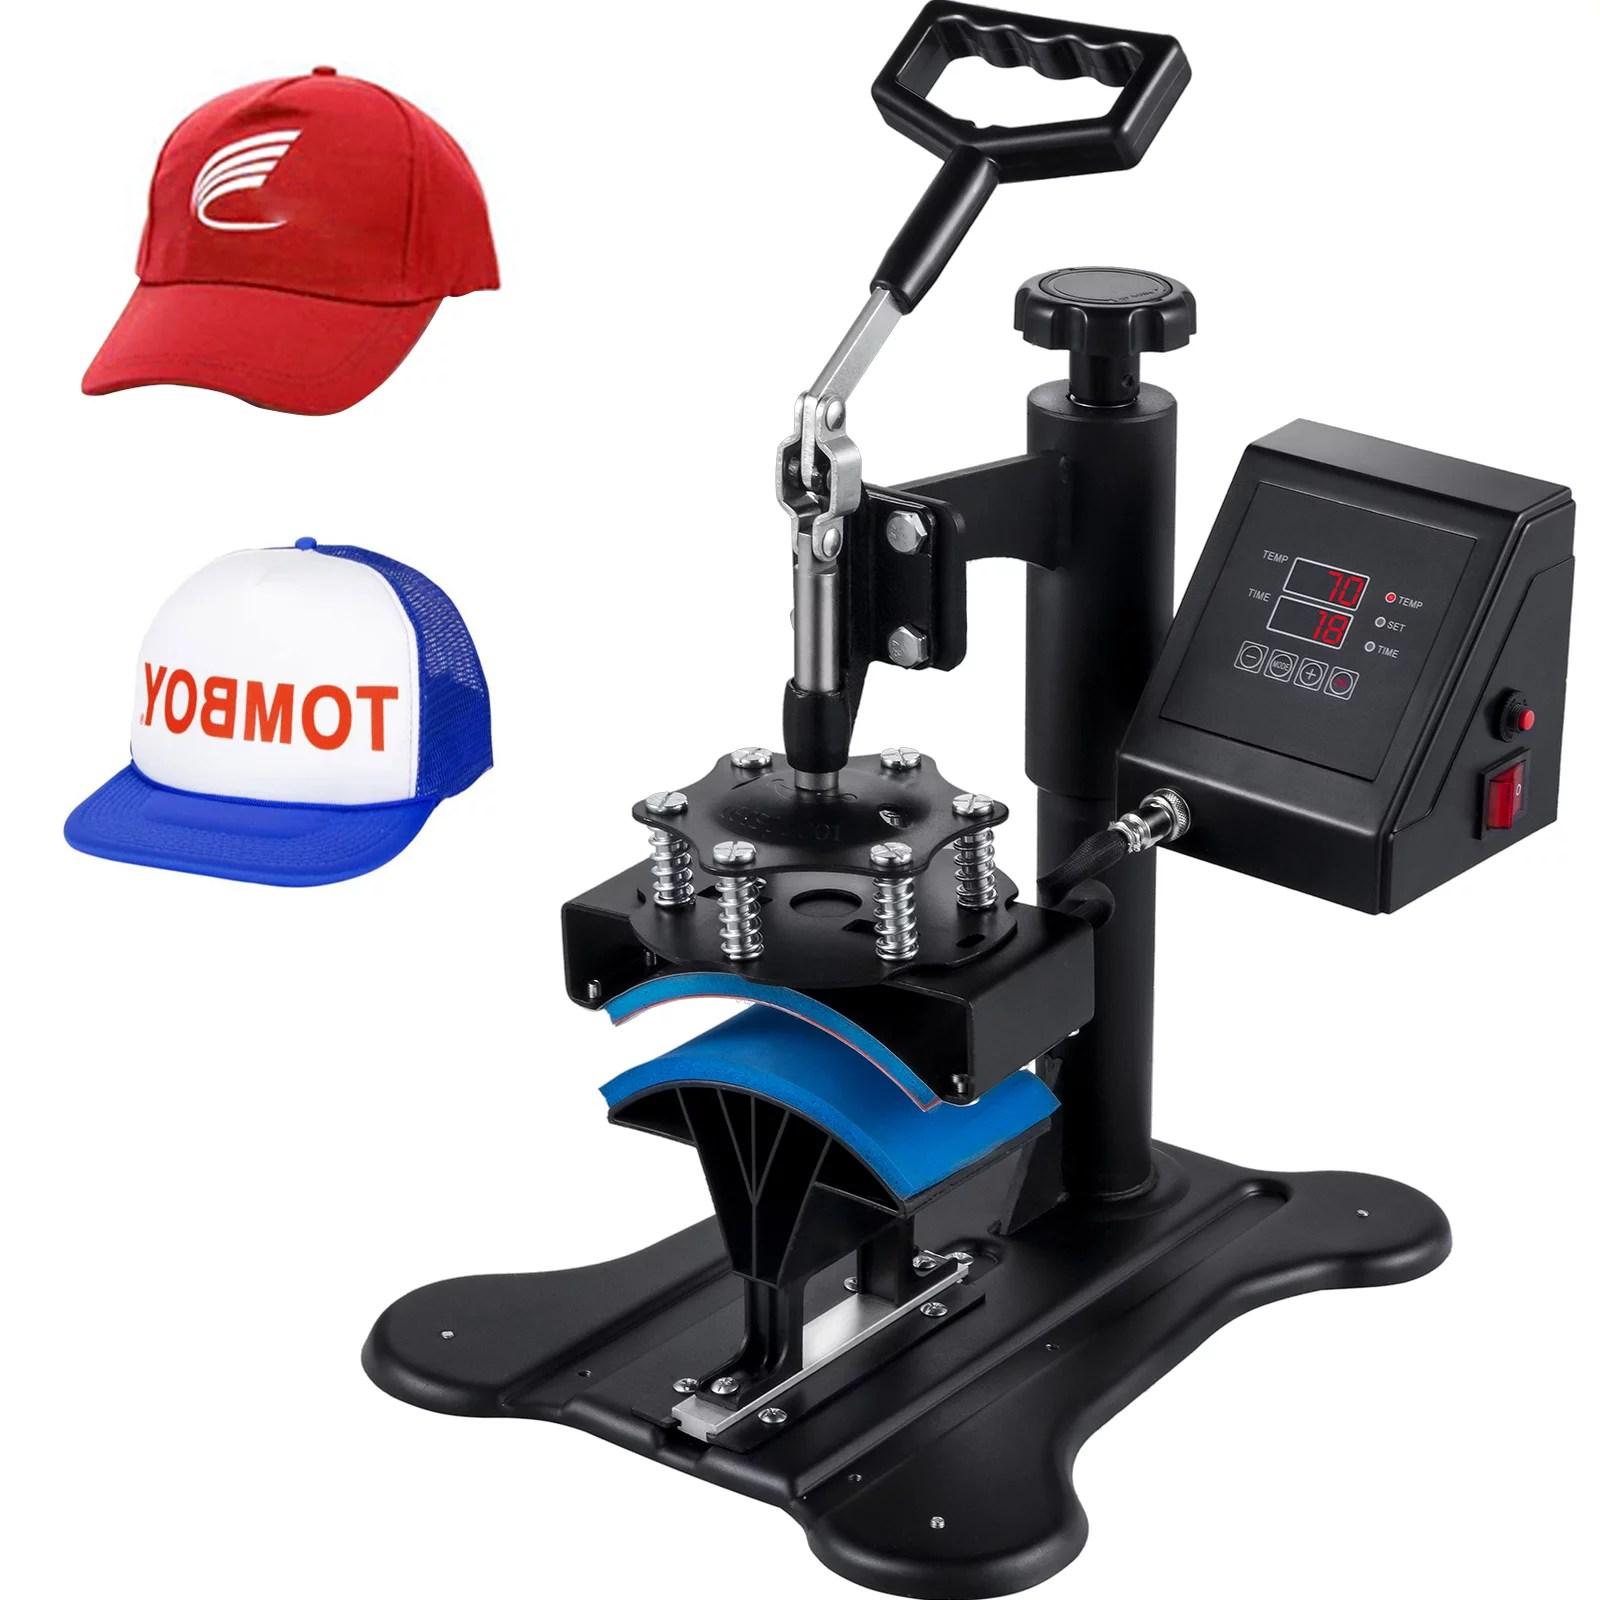 Vevor Cap Press 3 1 X 5 5 Inch Hat Press Machine Dual Digital Control Hat Heat Press Machine Durable Heat Press For Hats Baseball Hat Black Walmart Com Walmart Com